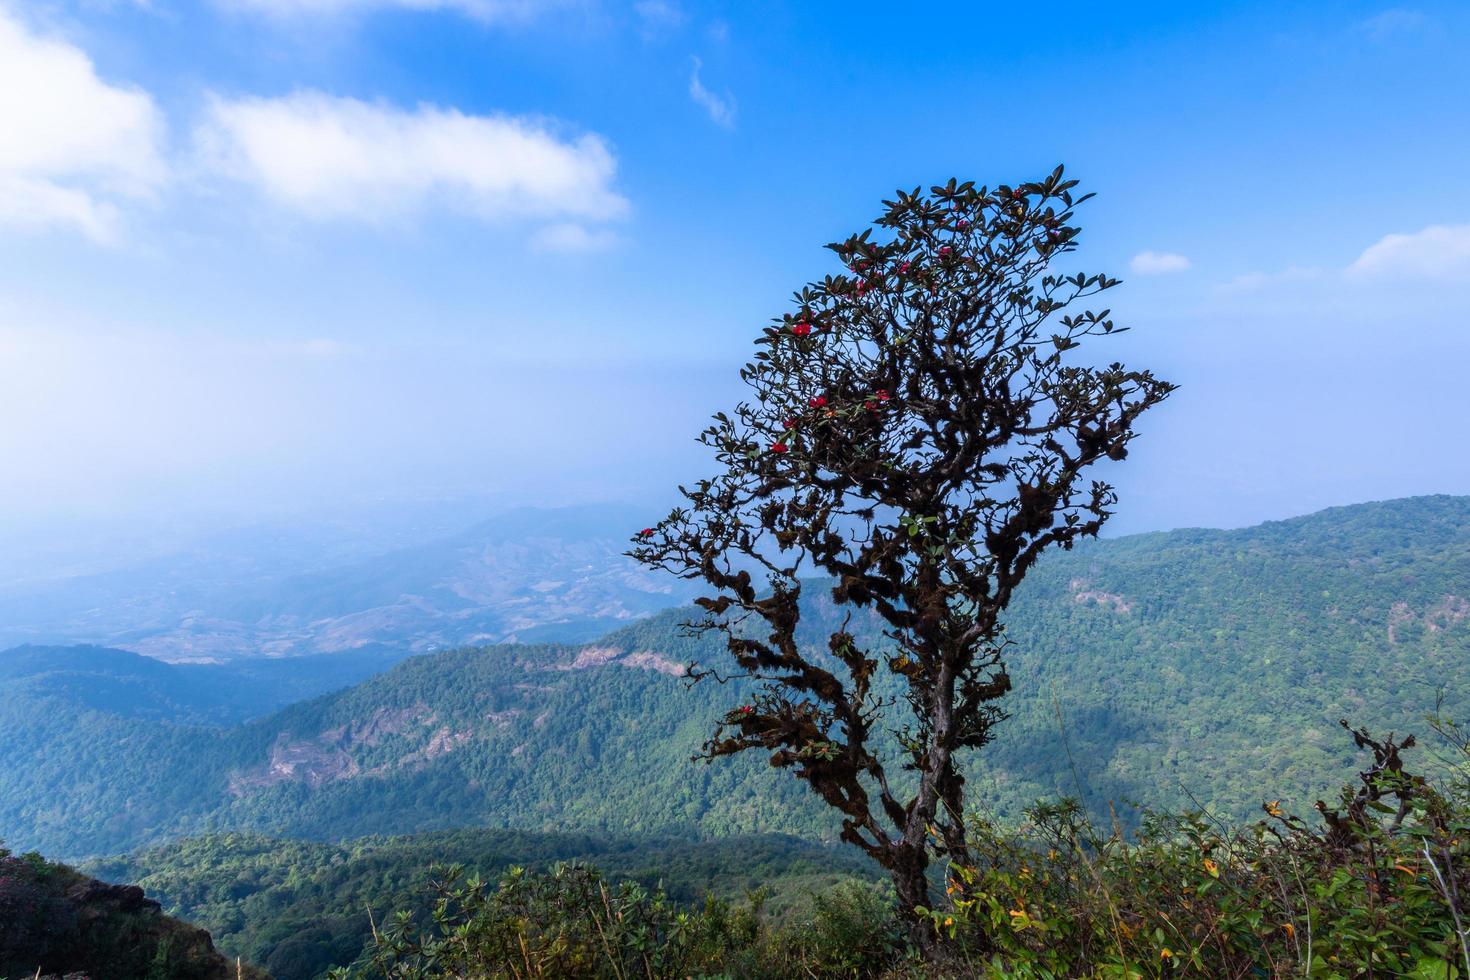 paesaggio a kew mae pan, thailandia foto